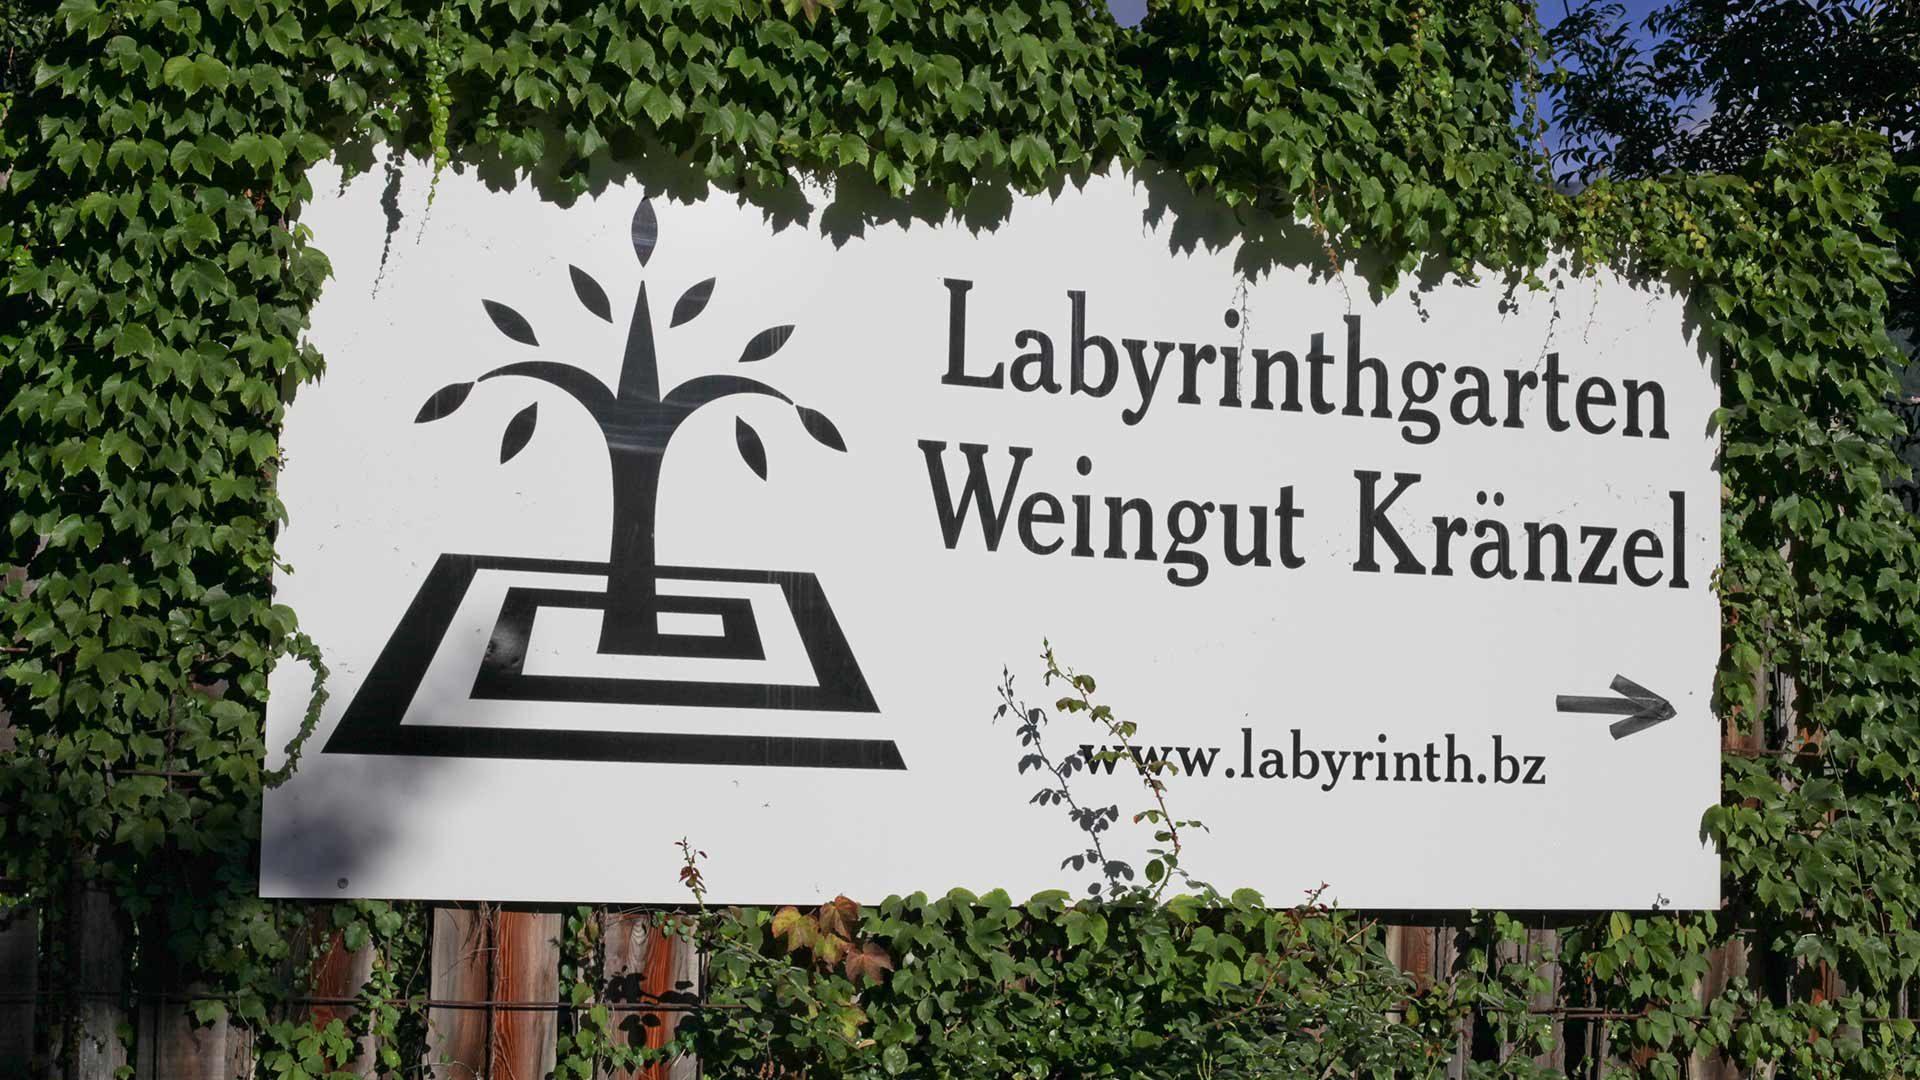 Weingut Kränzelhof